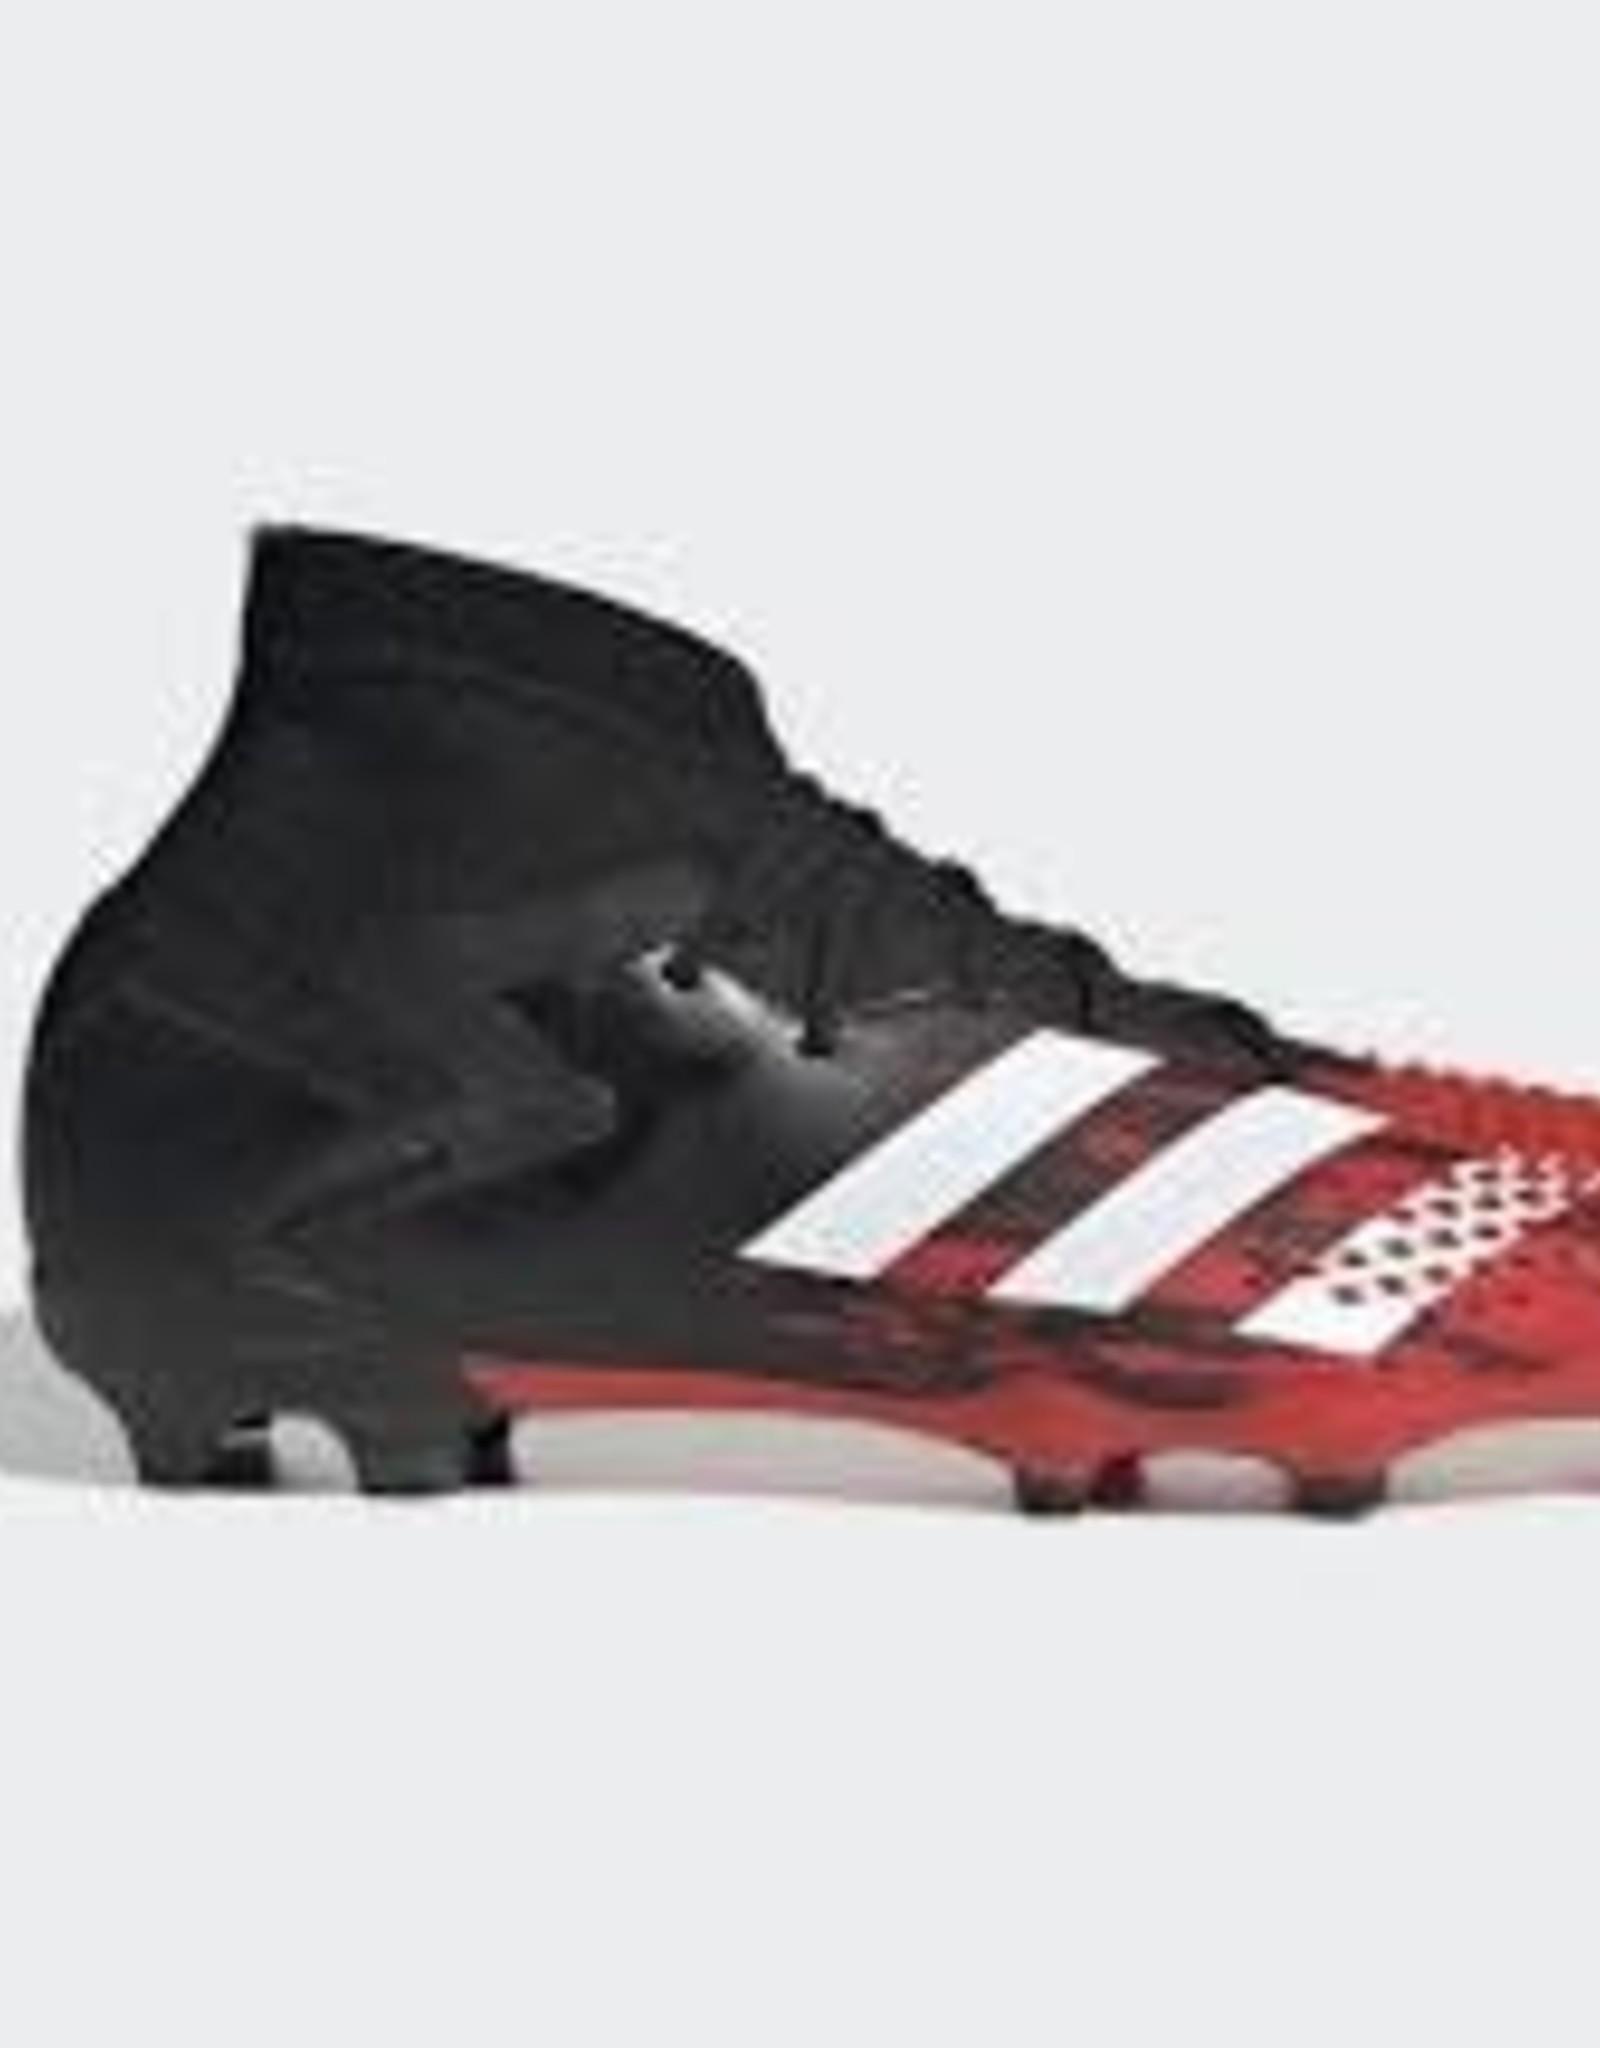 Adidas Adidas FG Predator Mutator 20.1 Jr